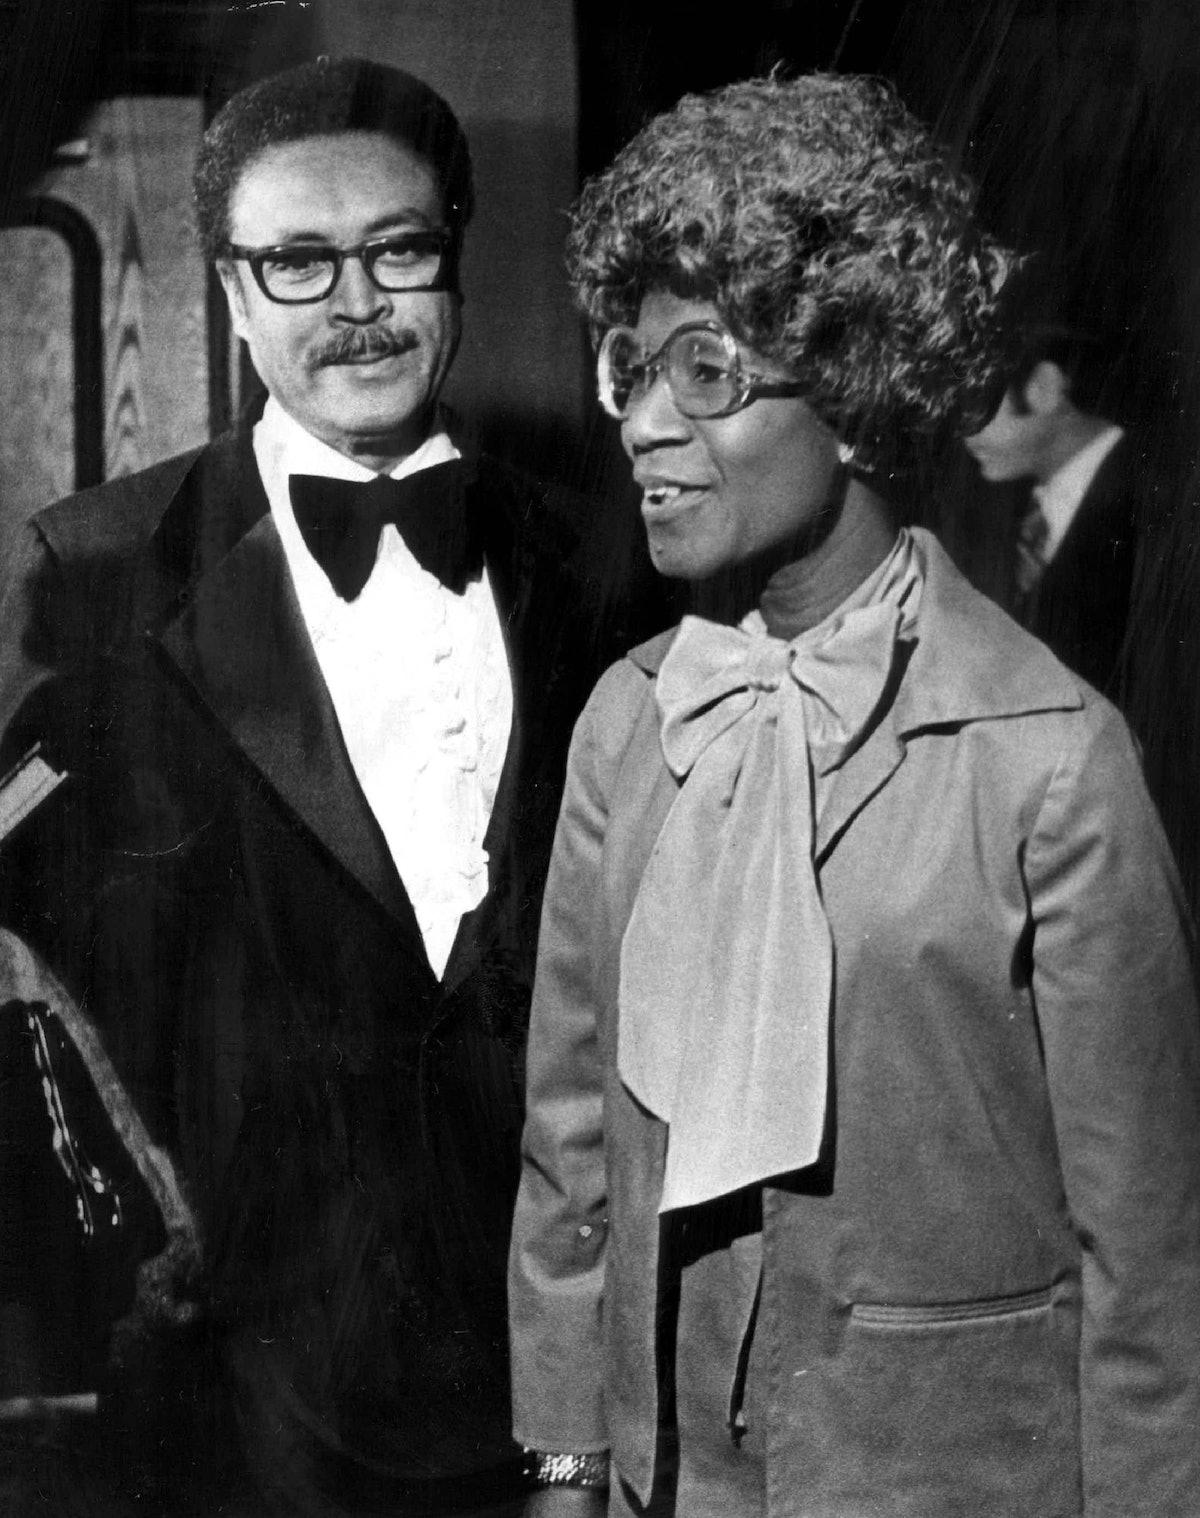 JAN 5 1979, JAN 6 1979; Testimonial Attractions; Lt. Gov. George Brown and U.S. Rep. Shirley Chishol